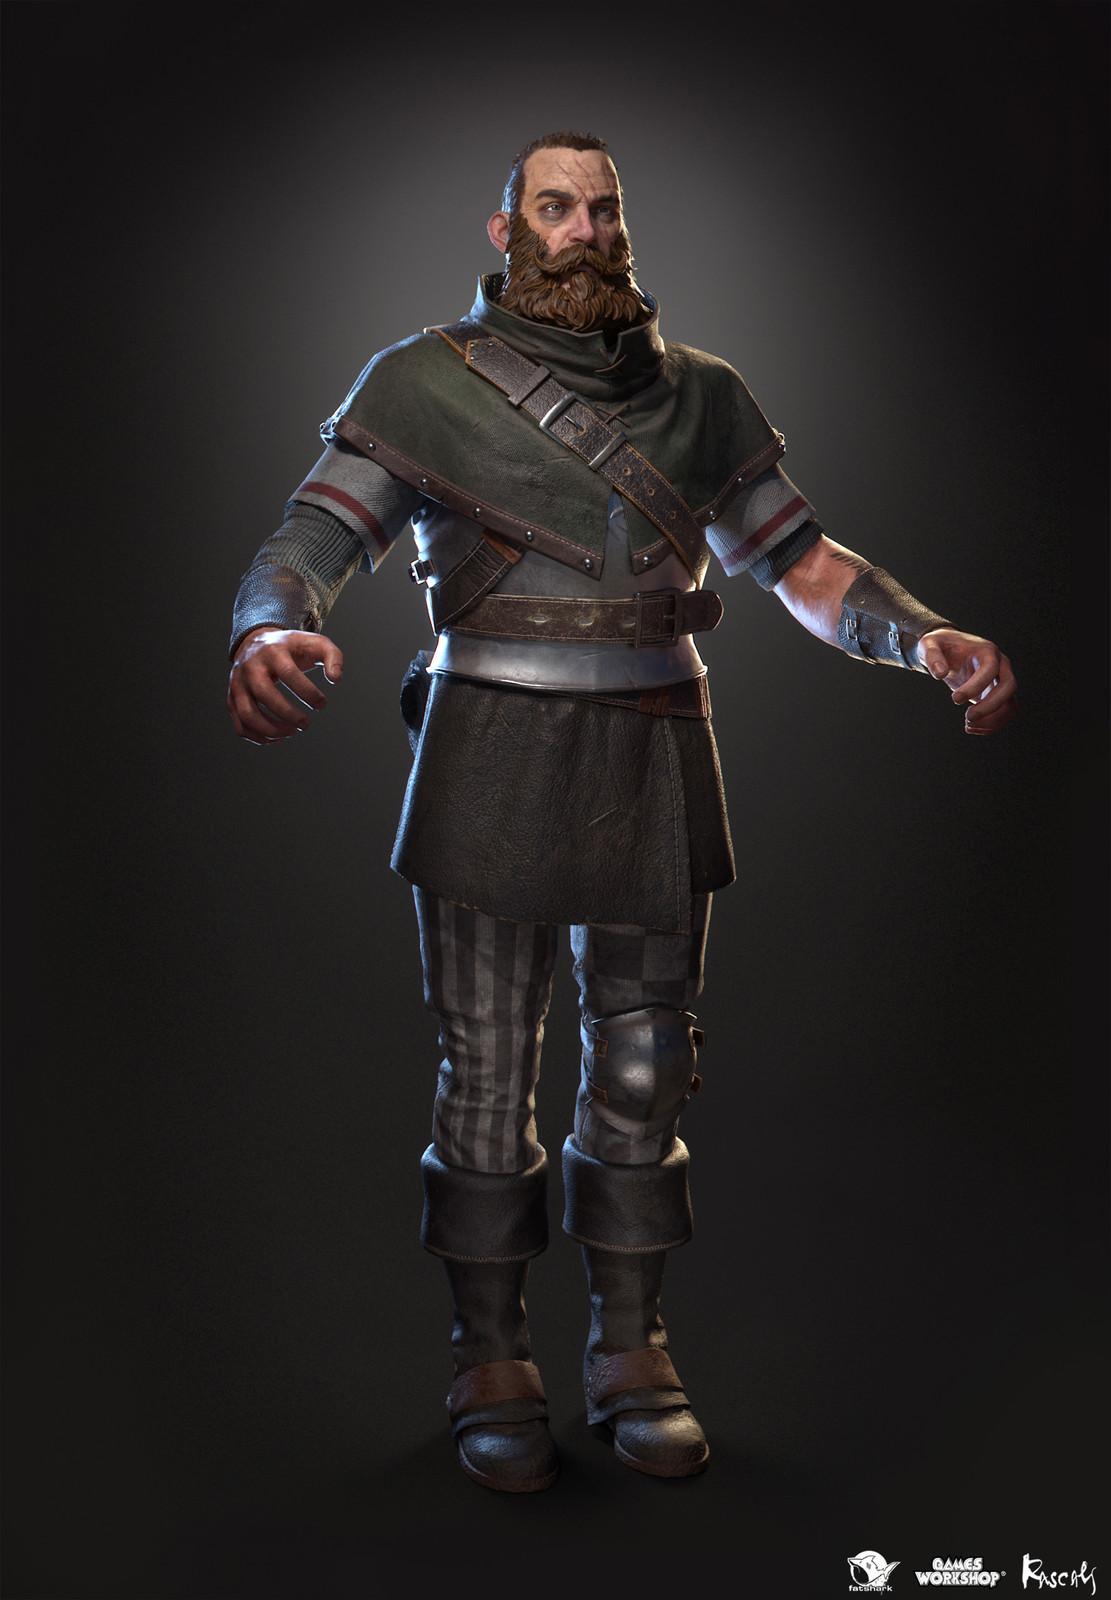 Markus Kruber: Huntsman is one of the playable hero variants Rascals made for Warhammer: Vermintide II, Fatshark's award-winning co-op meelee action published by Games Workshop.